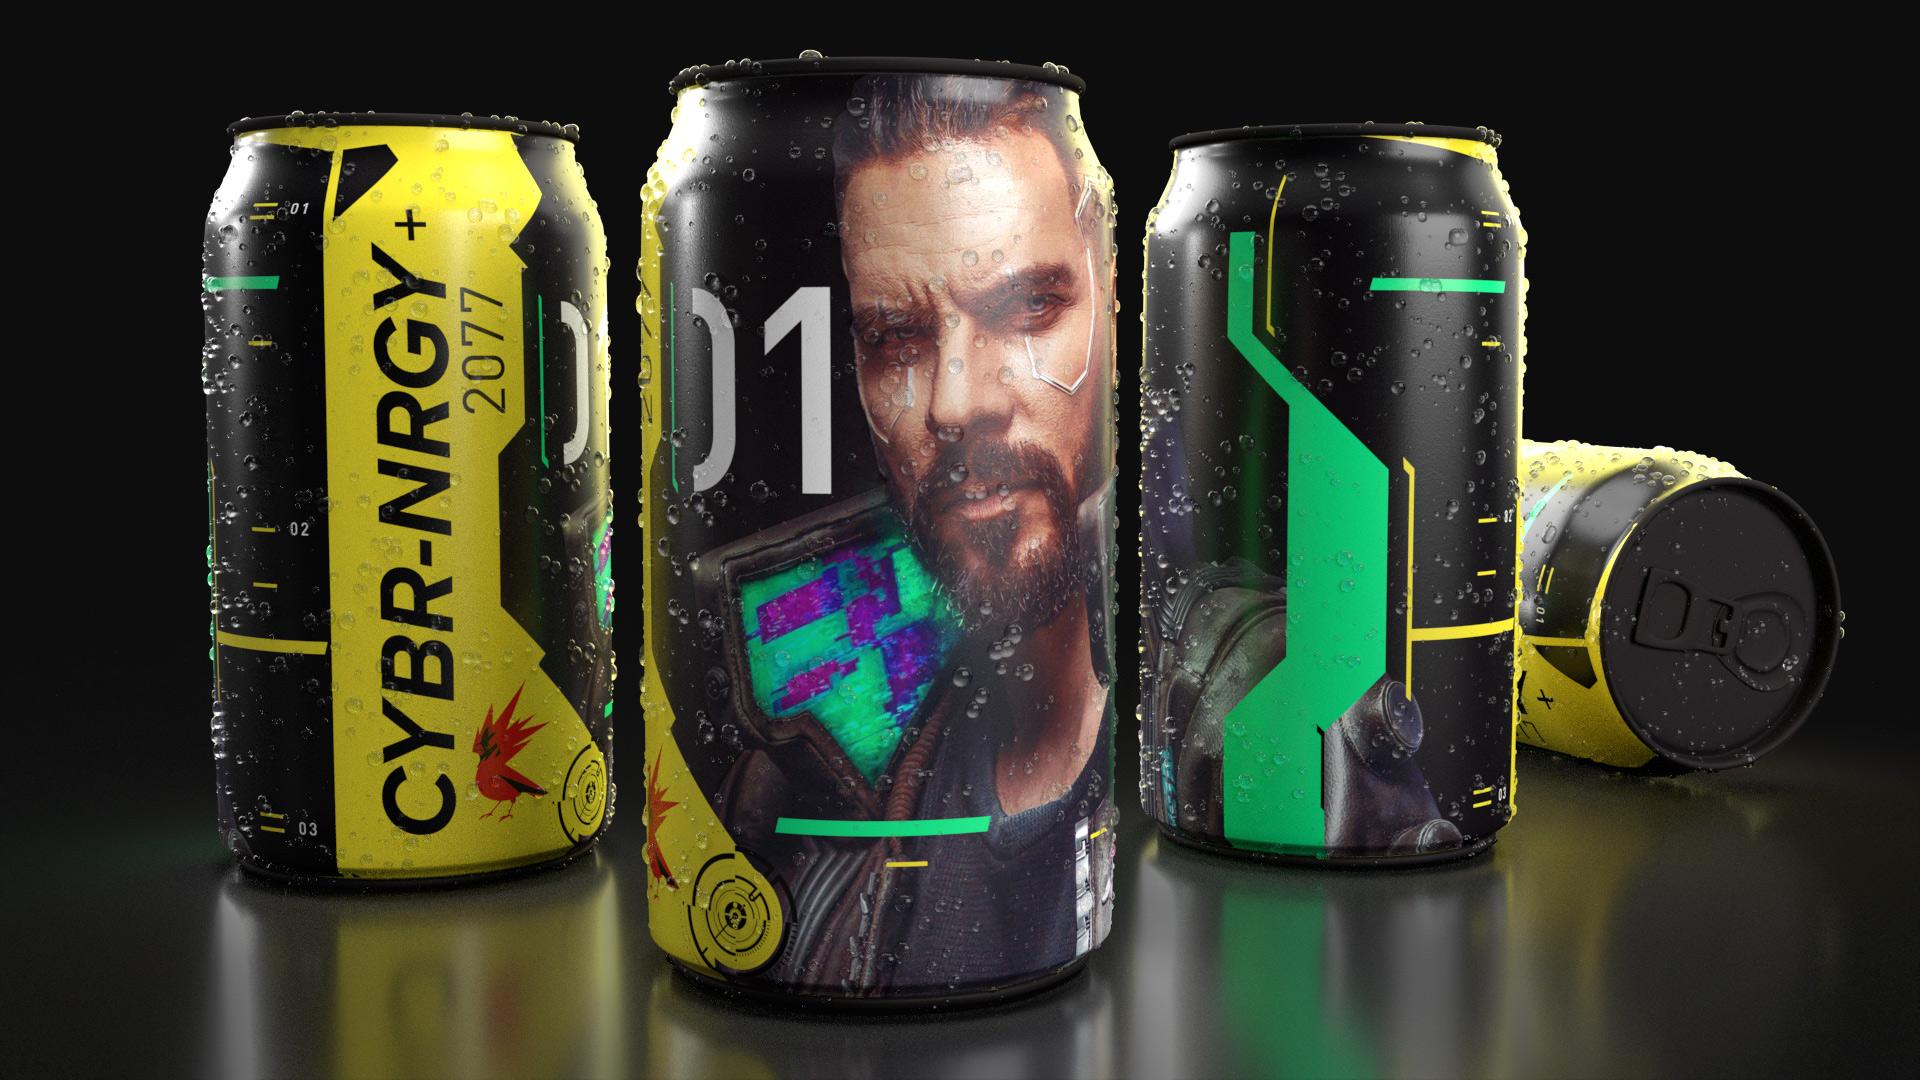 Cyberpunk 2077 energy drink cans